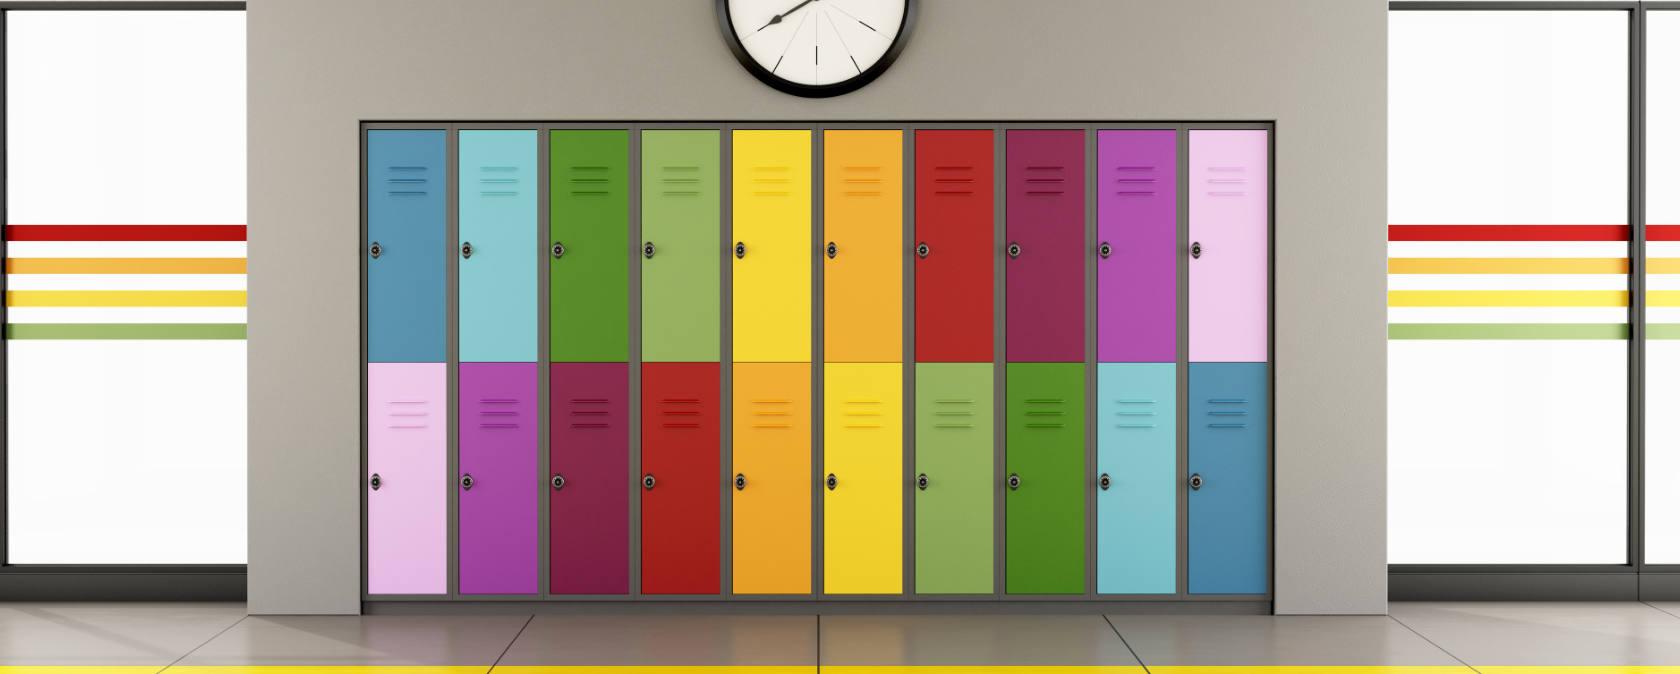 Colourful school lockers